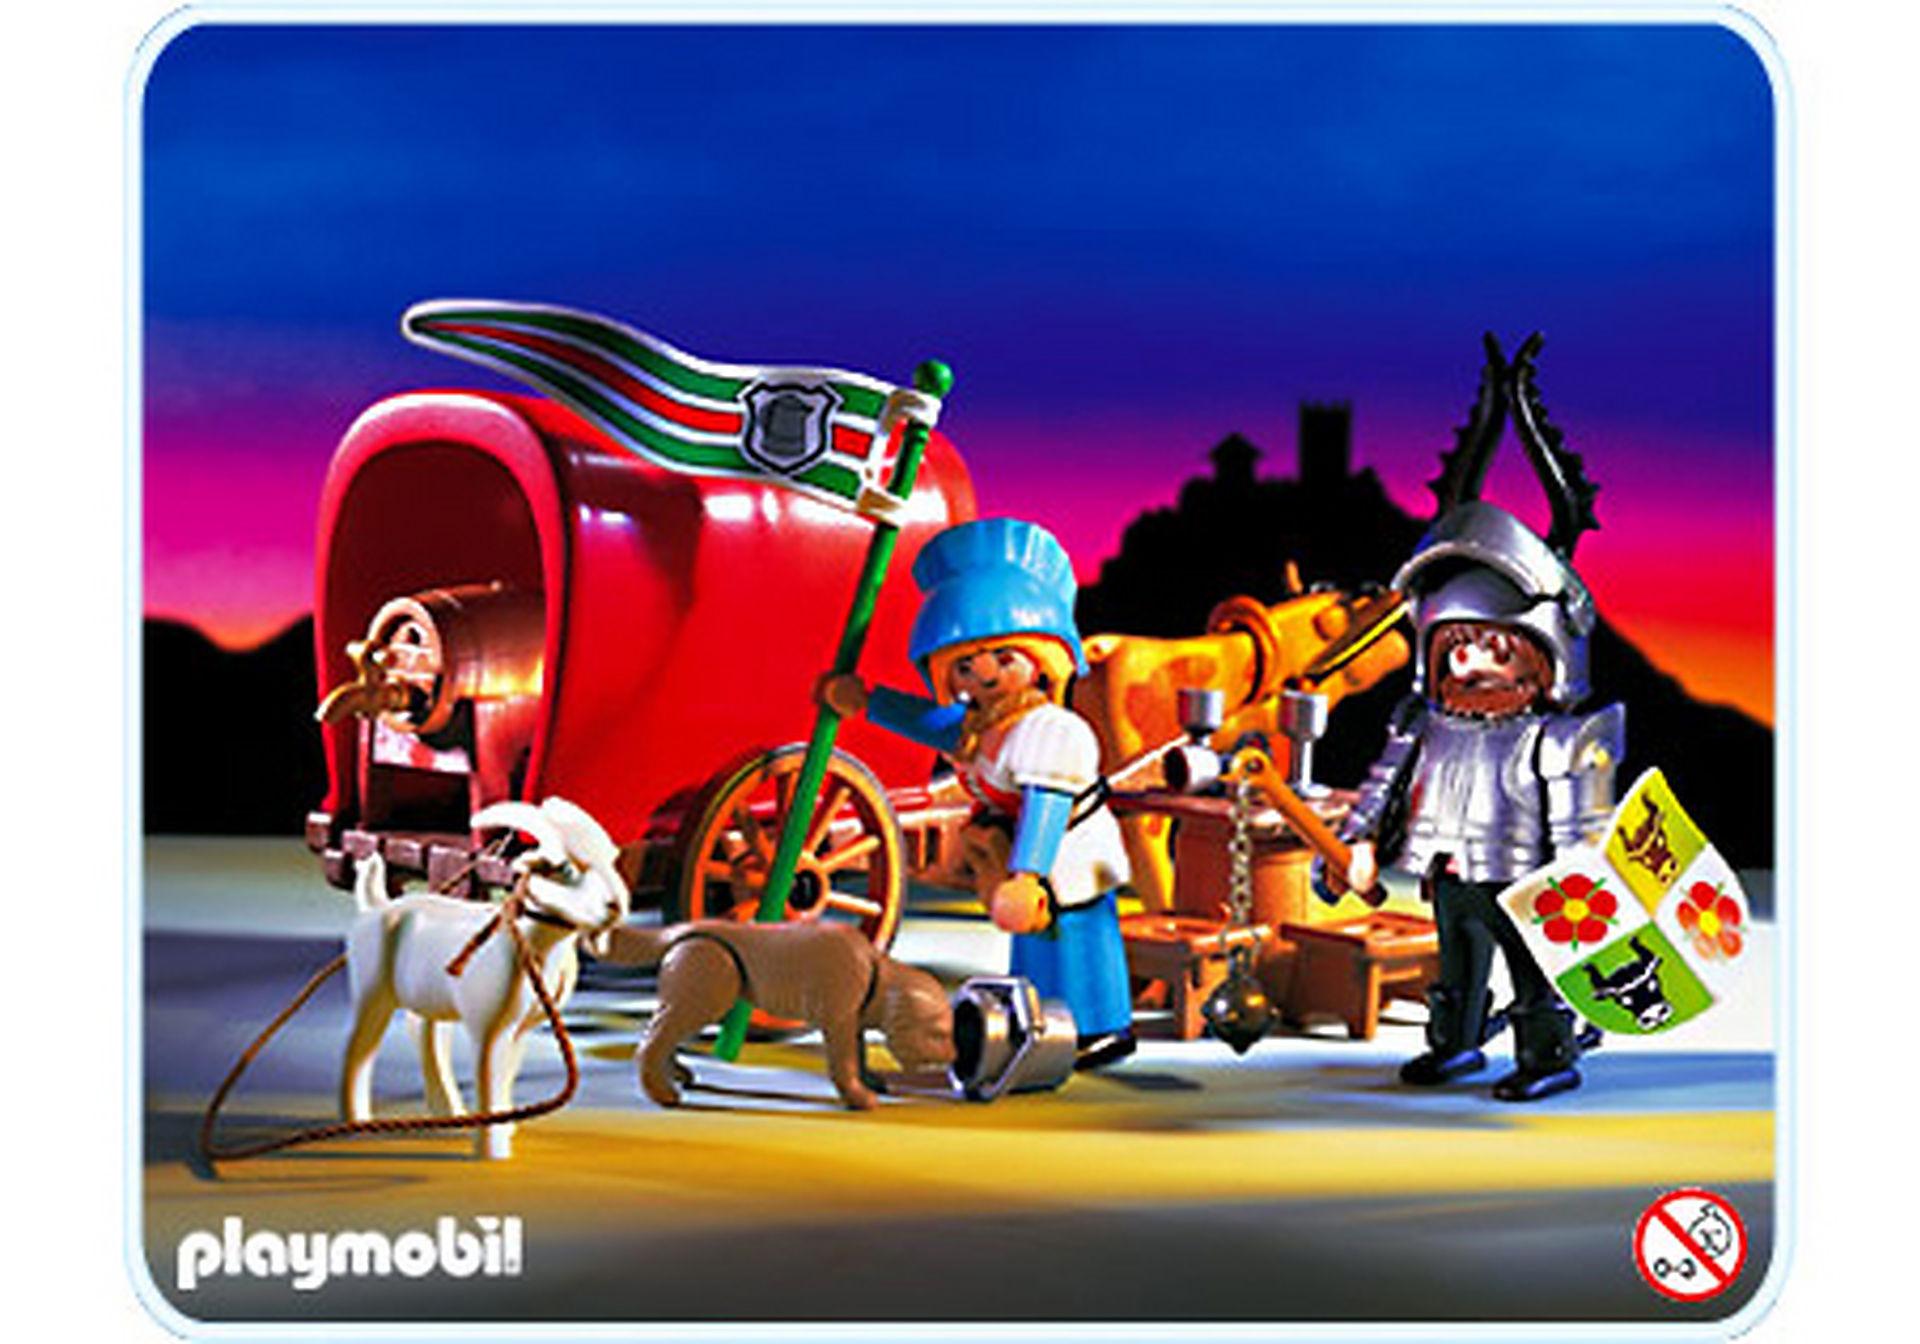 http://media.playmobil.com/i/playmobil/3891-A_product_detail/Ritter / Trosswagen